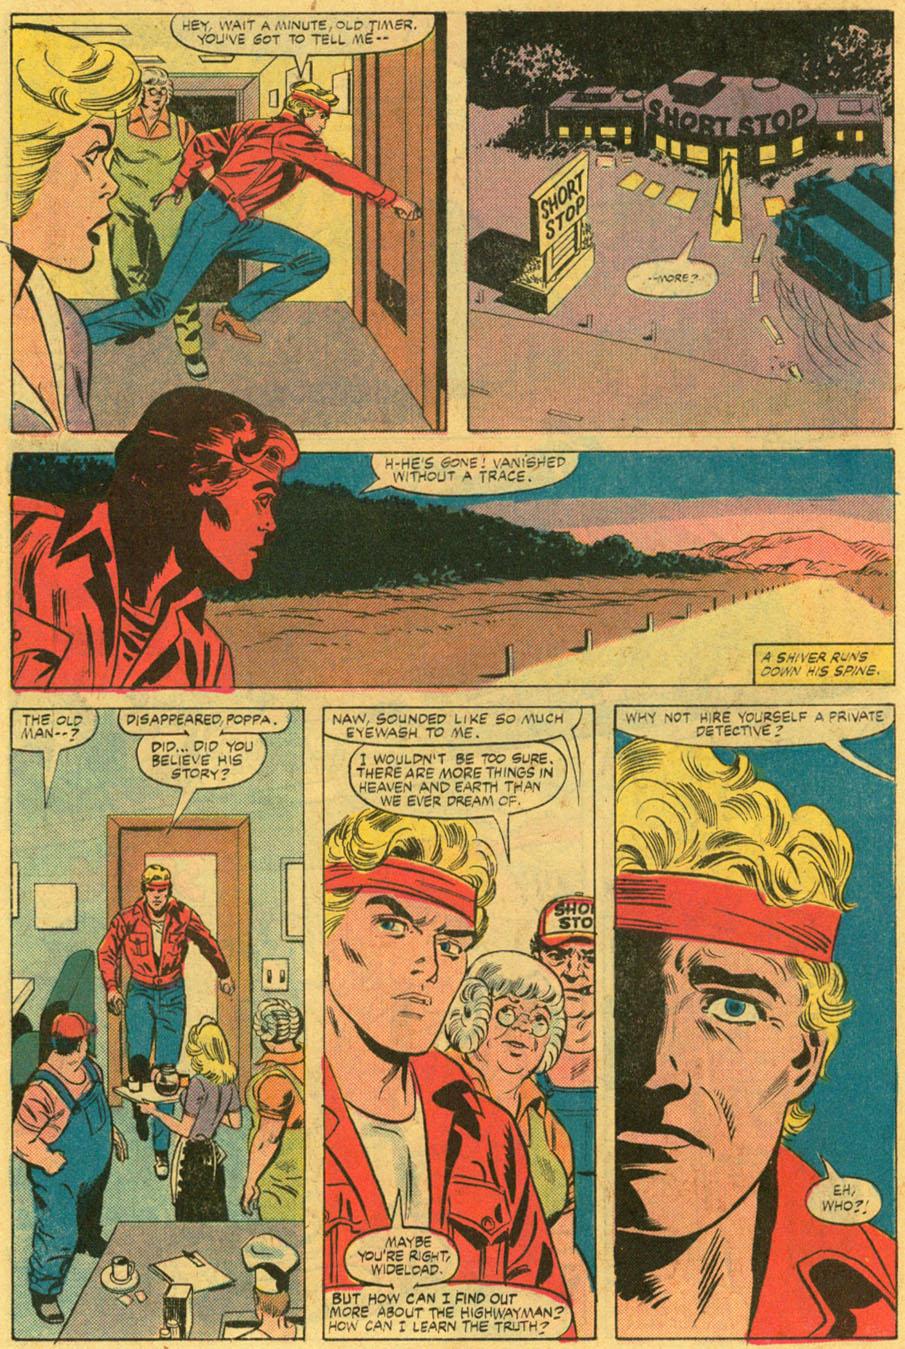 Read online U.S. 1 comic -  Issue #3 - 8